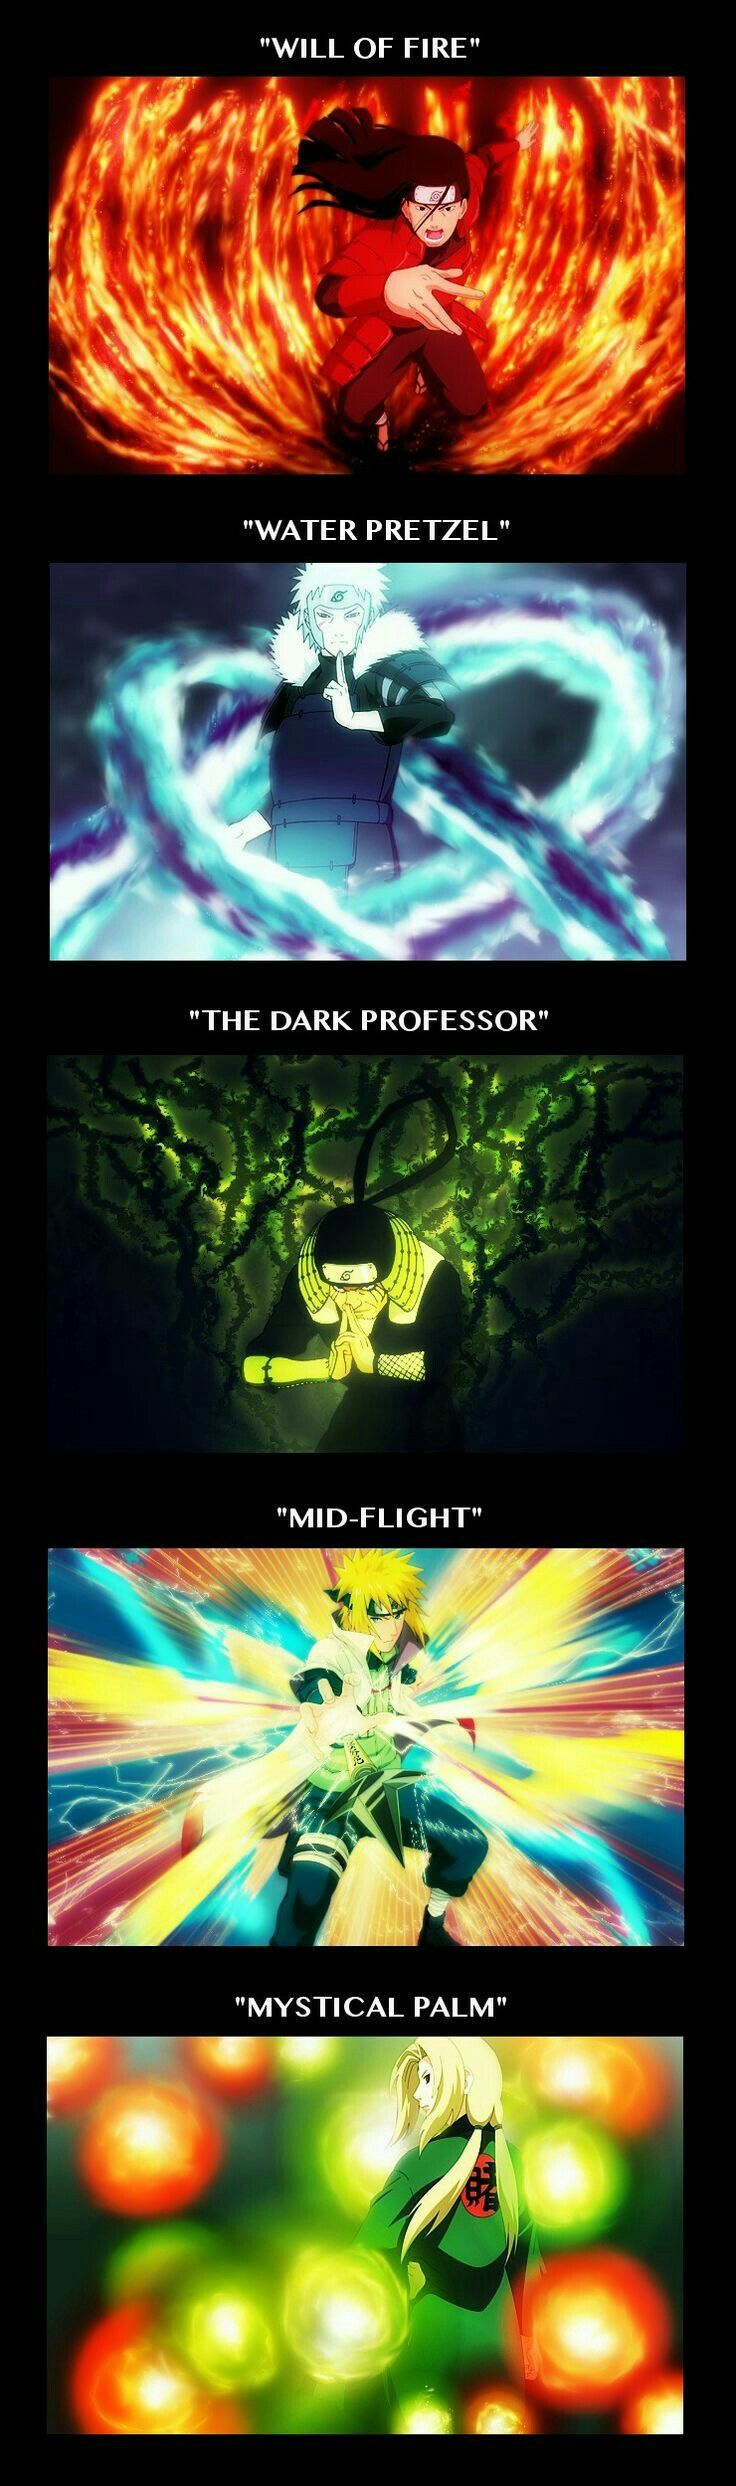 Will of Fire, Water Pretzel, The Dark Professor, Mid-Flight, Mystical Palm, Hokages, jutsu, Hashirama, Tobirama, Sarutobi, Minato, Tsunade, text; Naruto